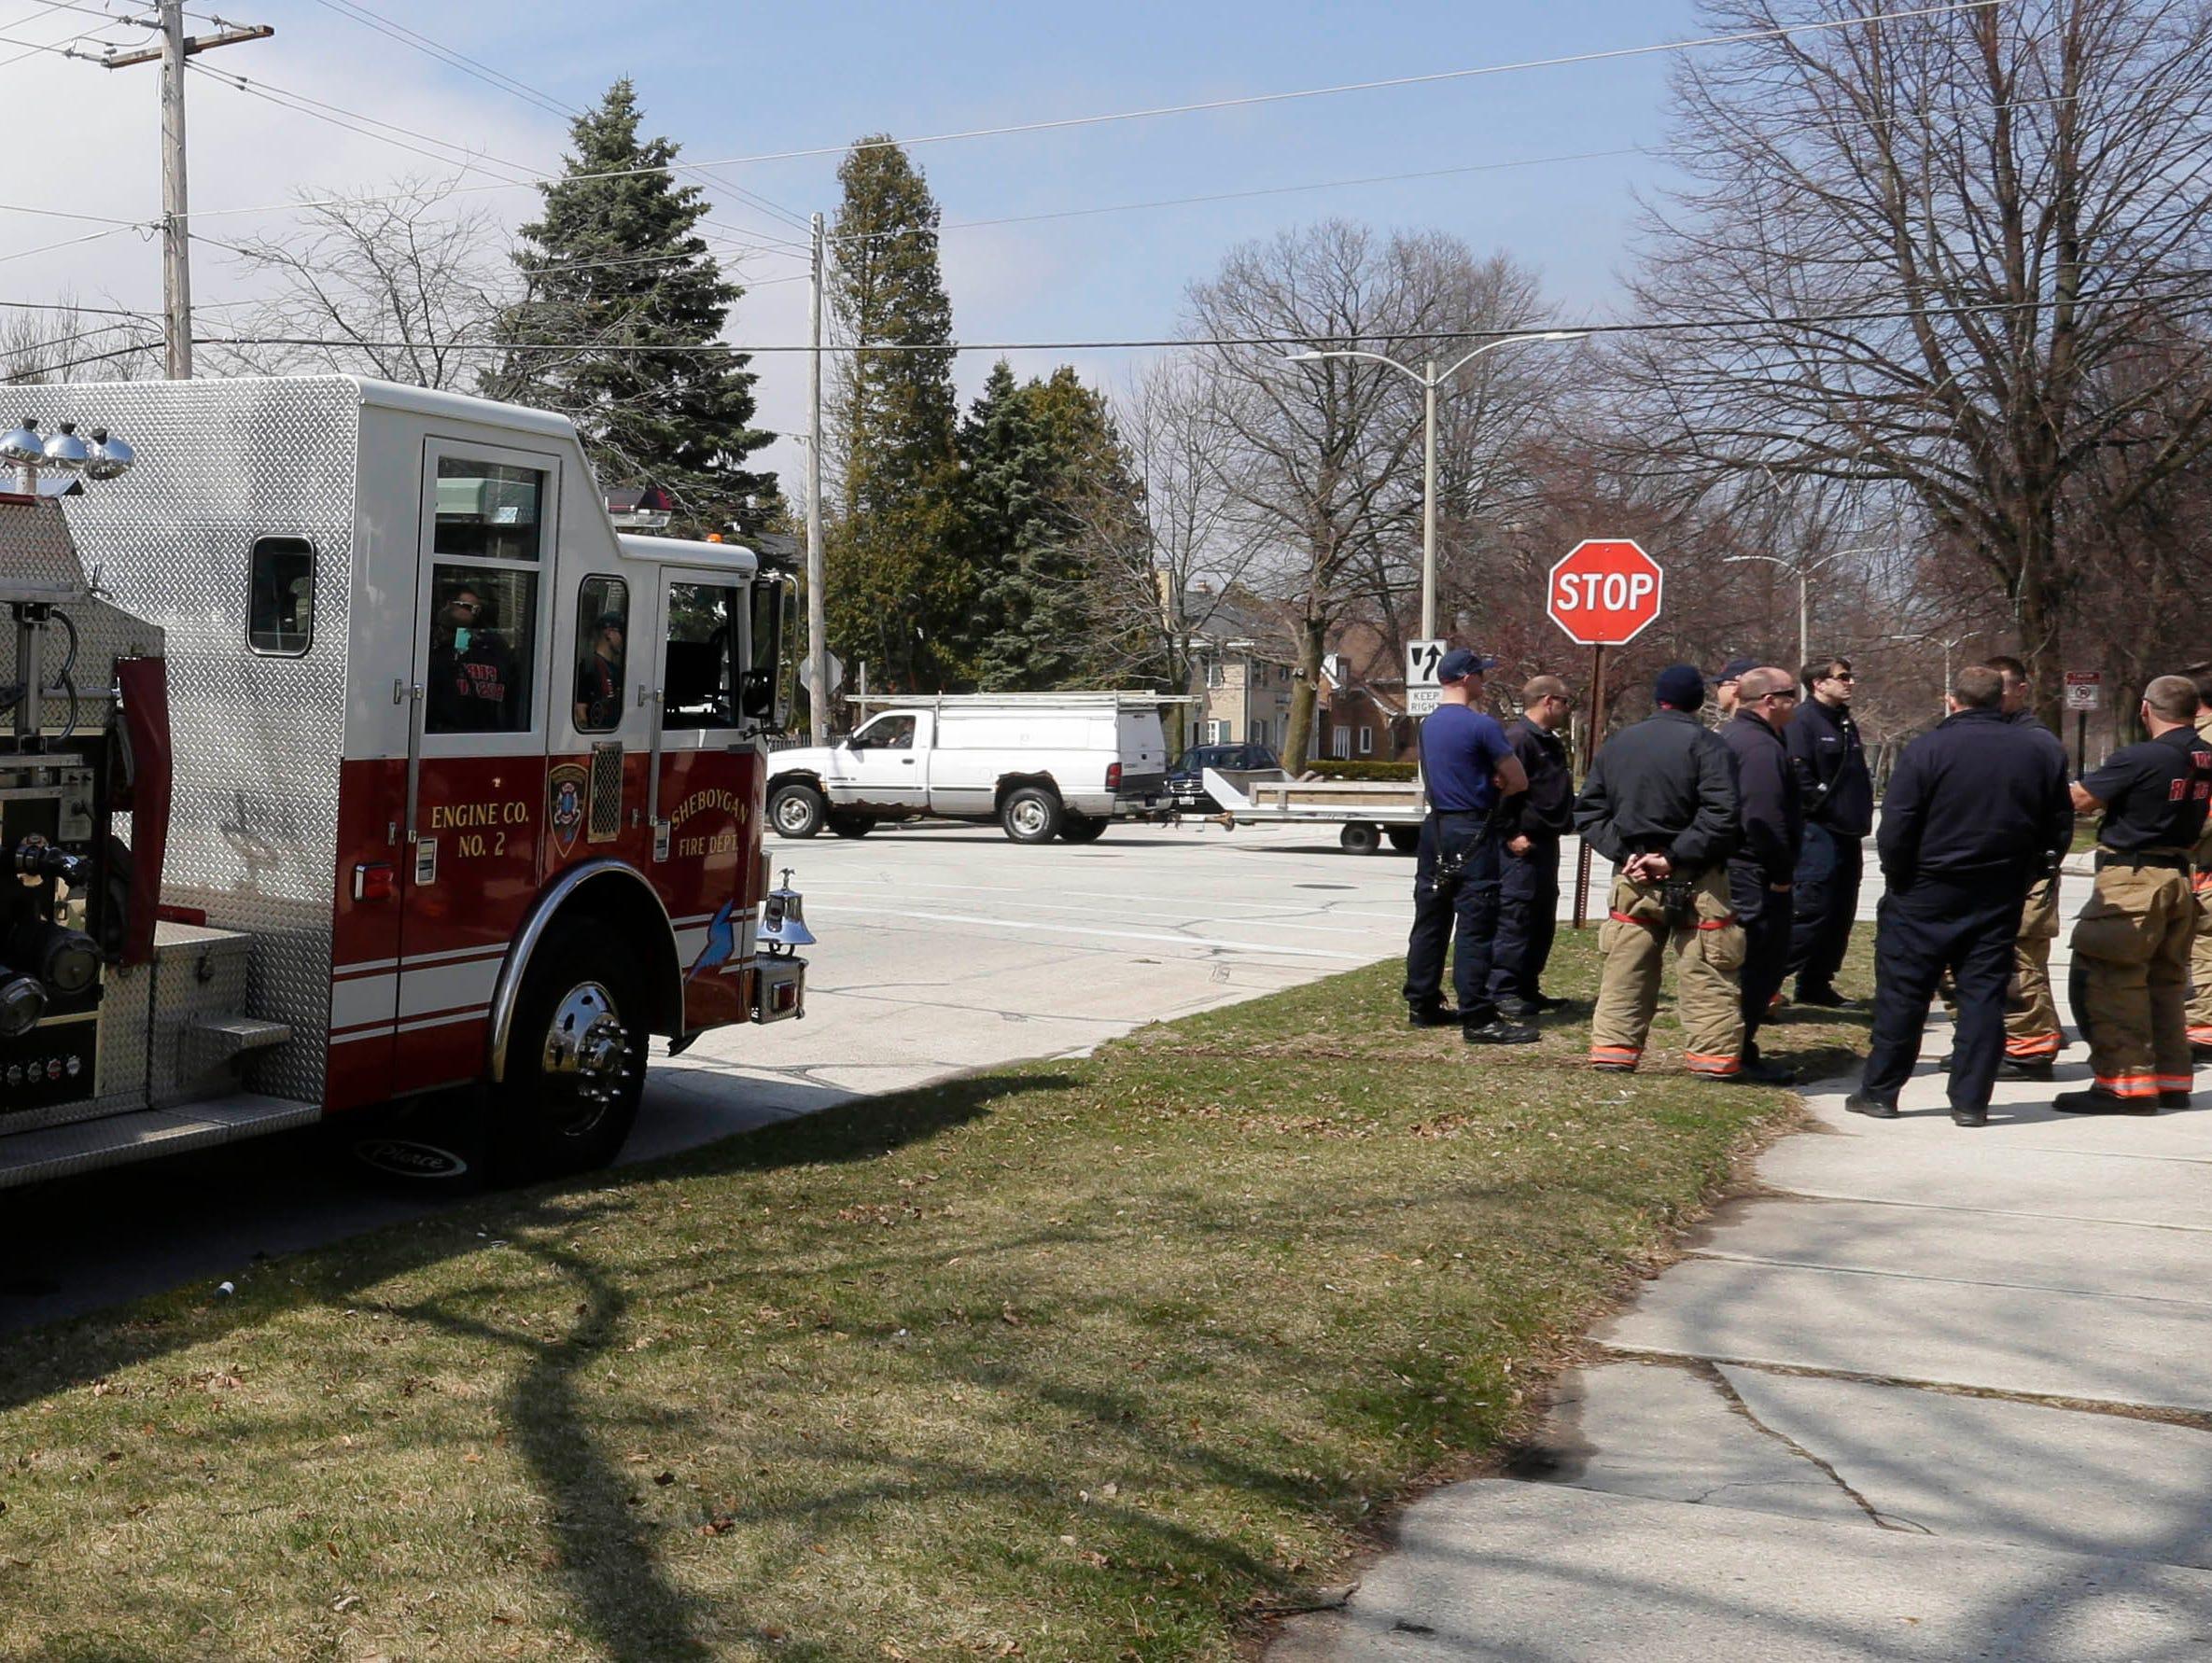 DRILL EXERCISE: Sheboygan firefighters group before a training exercise for Sheboygan area emergency agencies at Aurora Sheboygan Medical Center,Tuesday, April 16, 2019, in Sheboygan, Wis.